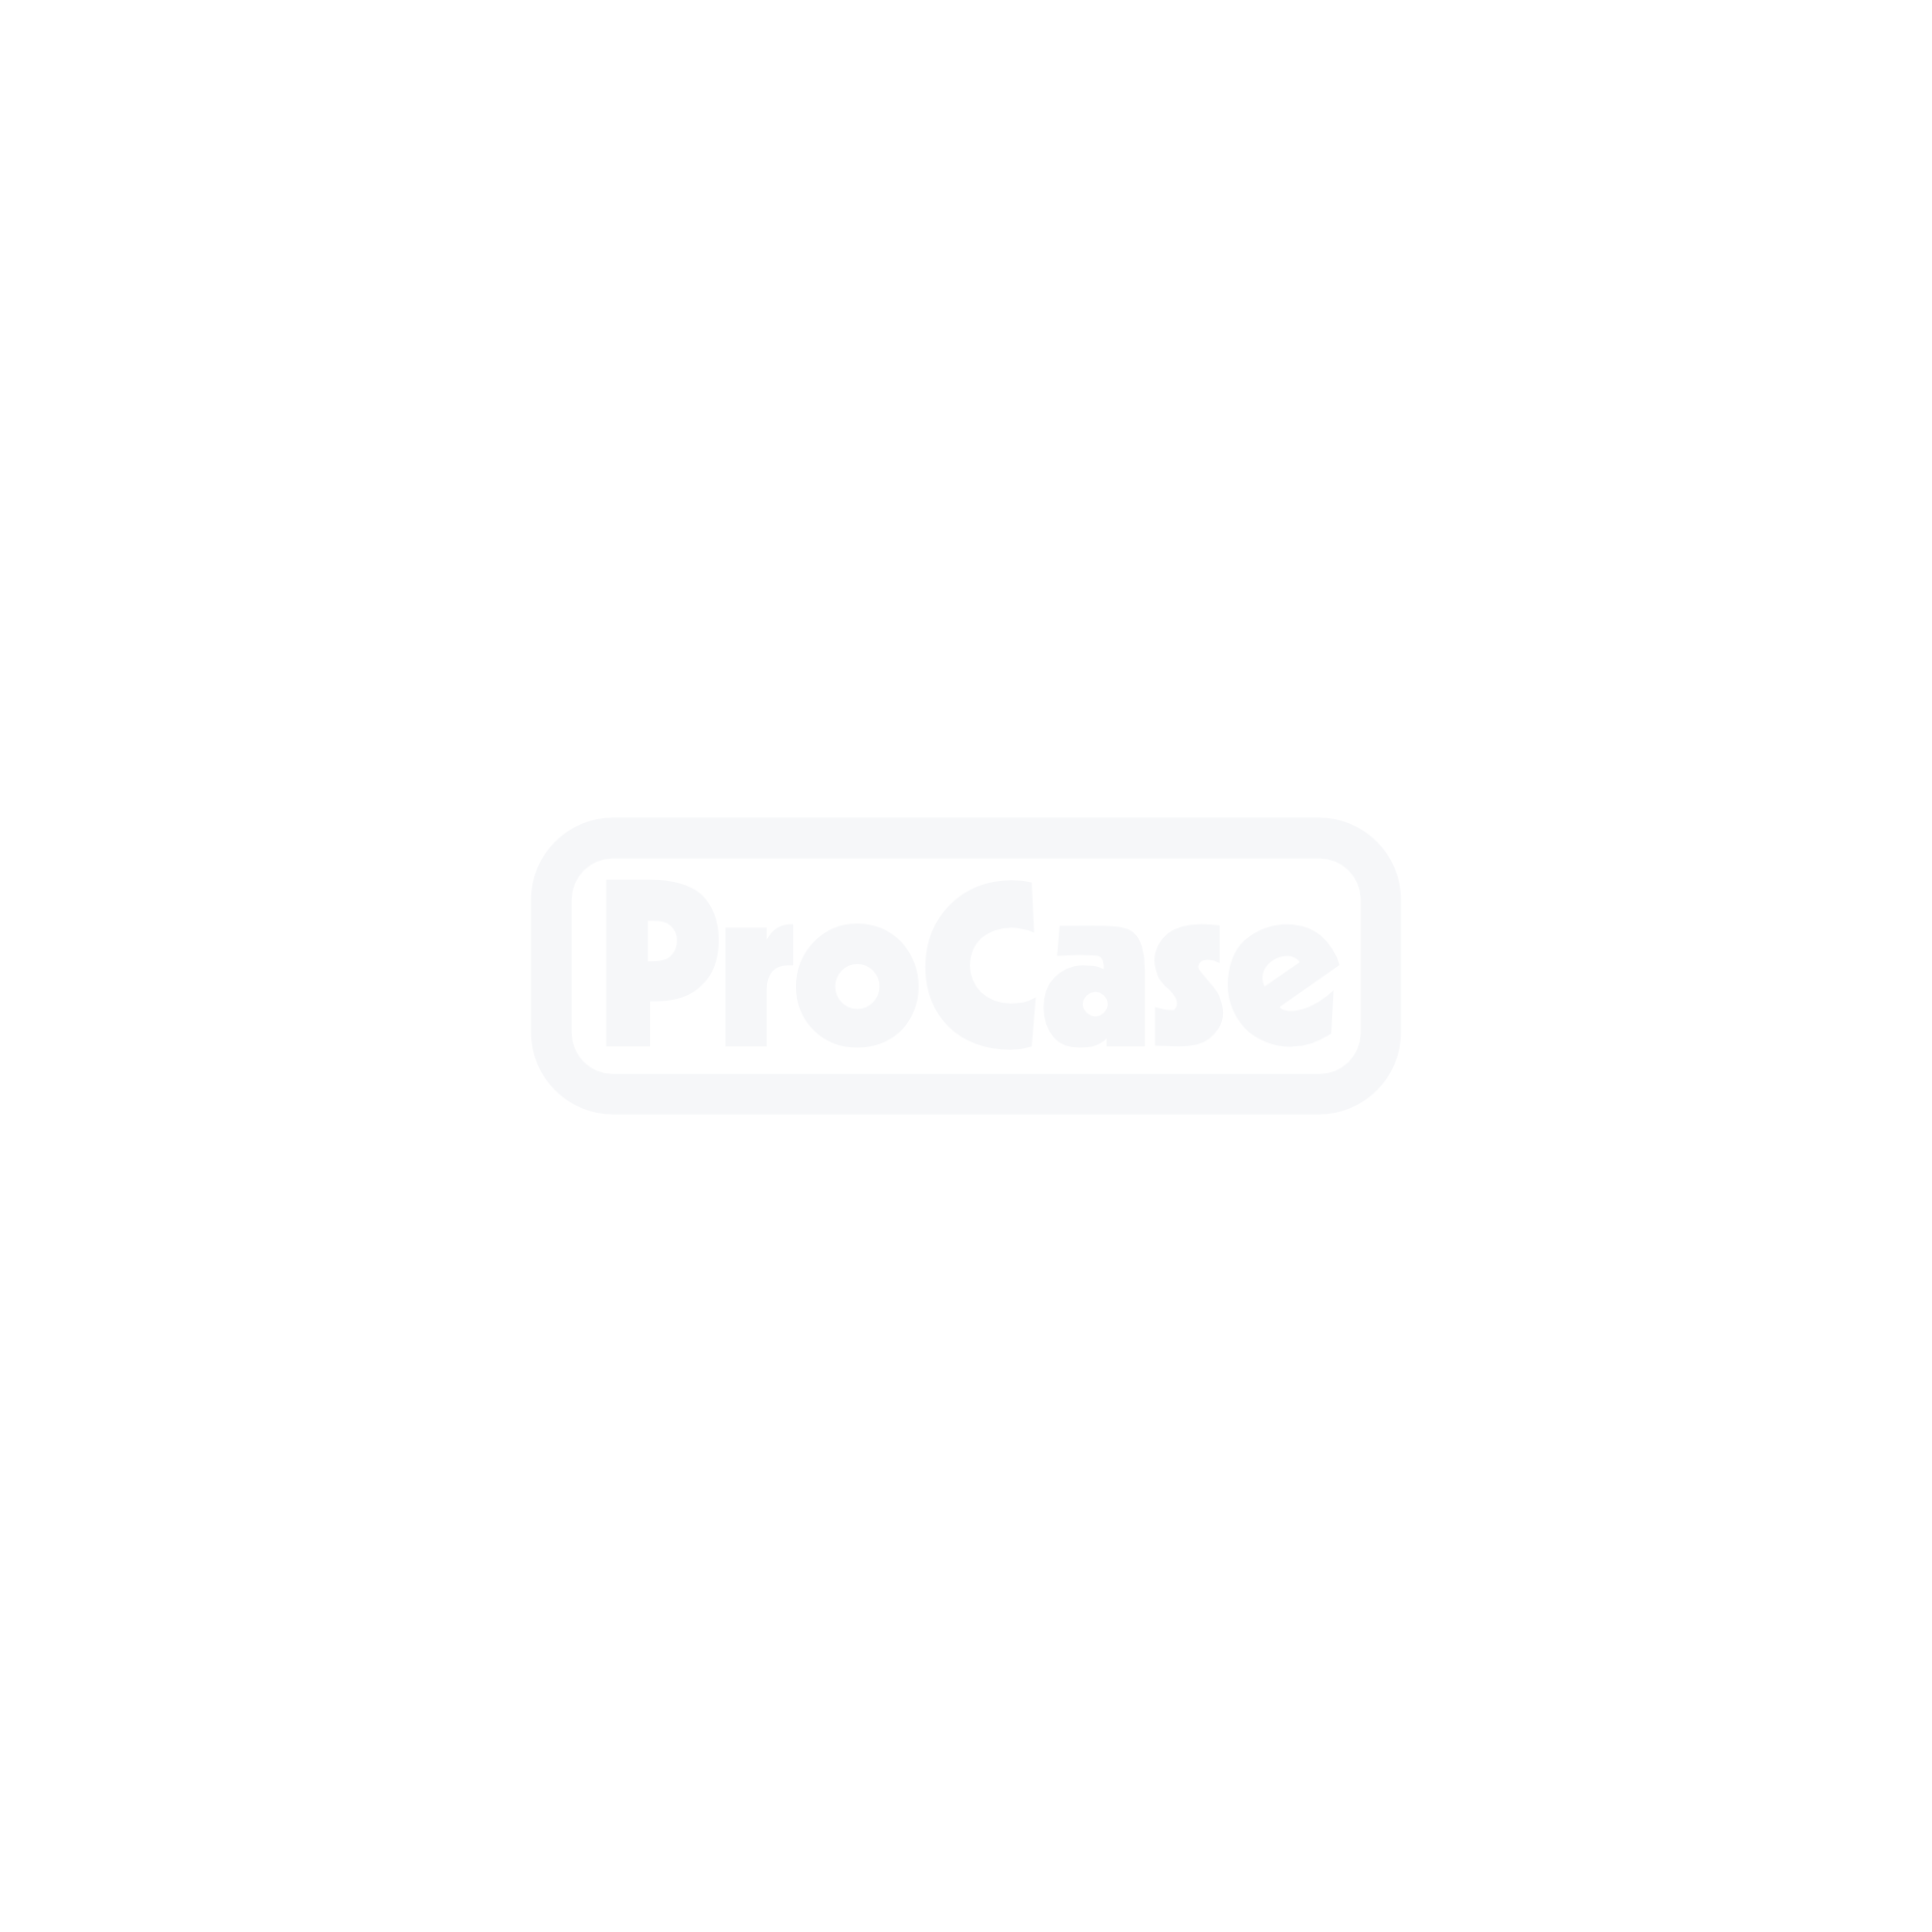 Flightcase für MA Lighting onPC fader wing (1x) 2